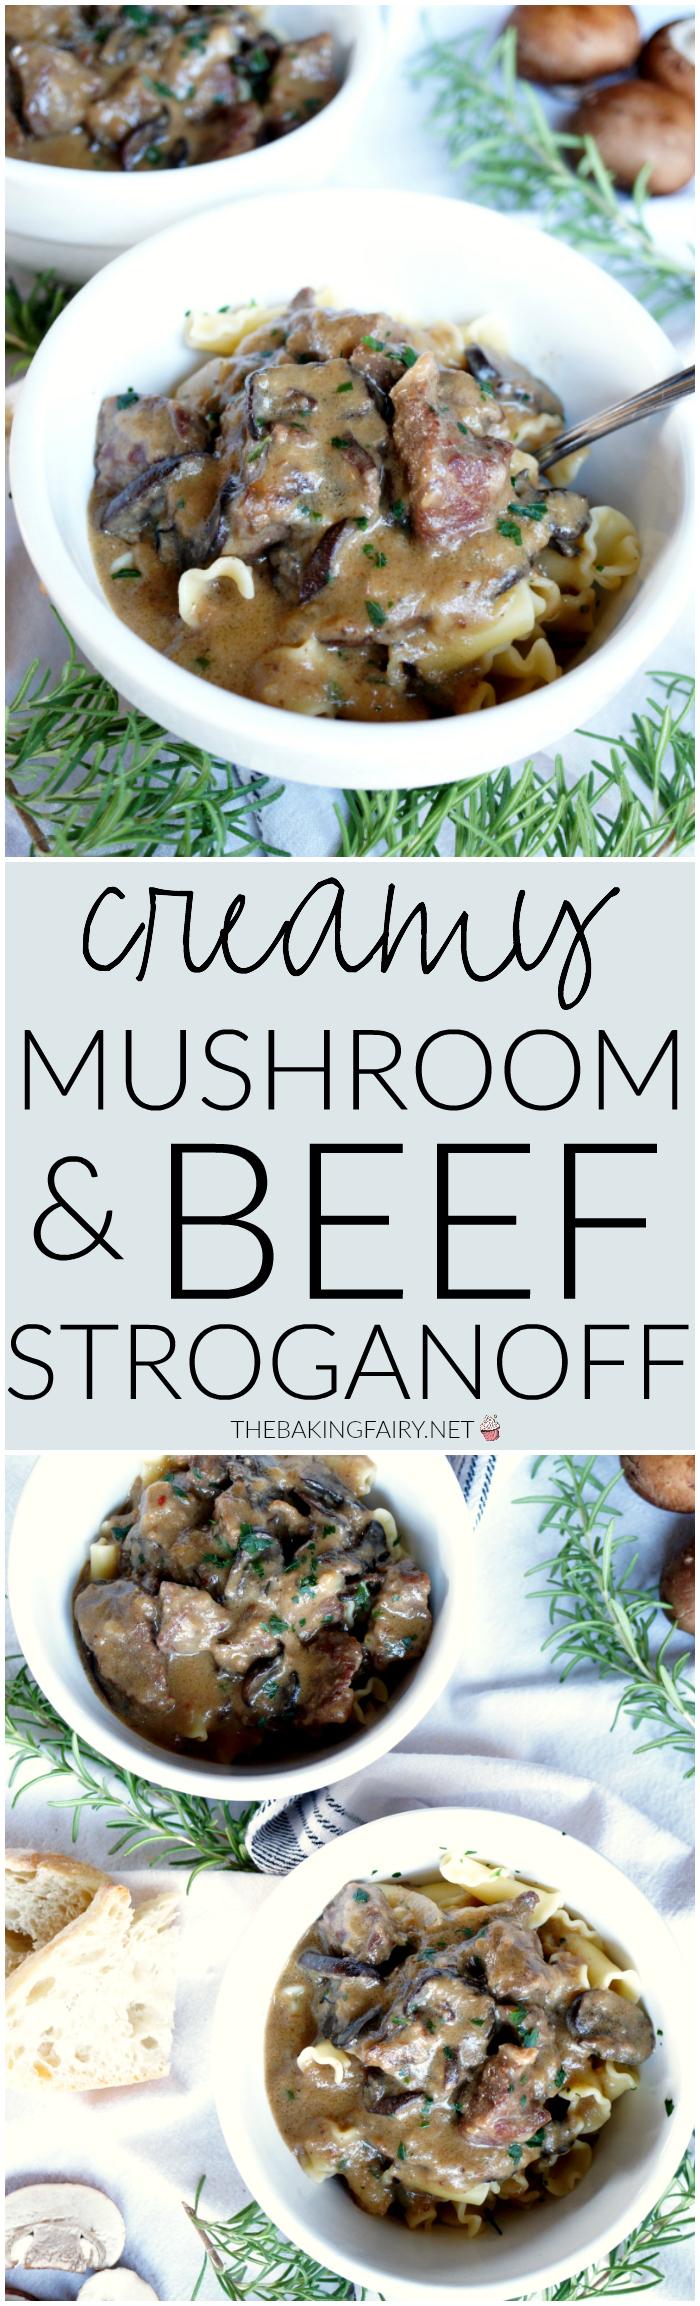 creamy mushroom and beef stroganoff | The Baking Fairy